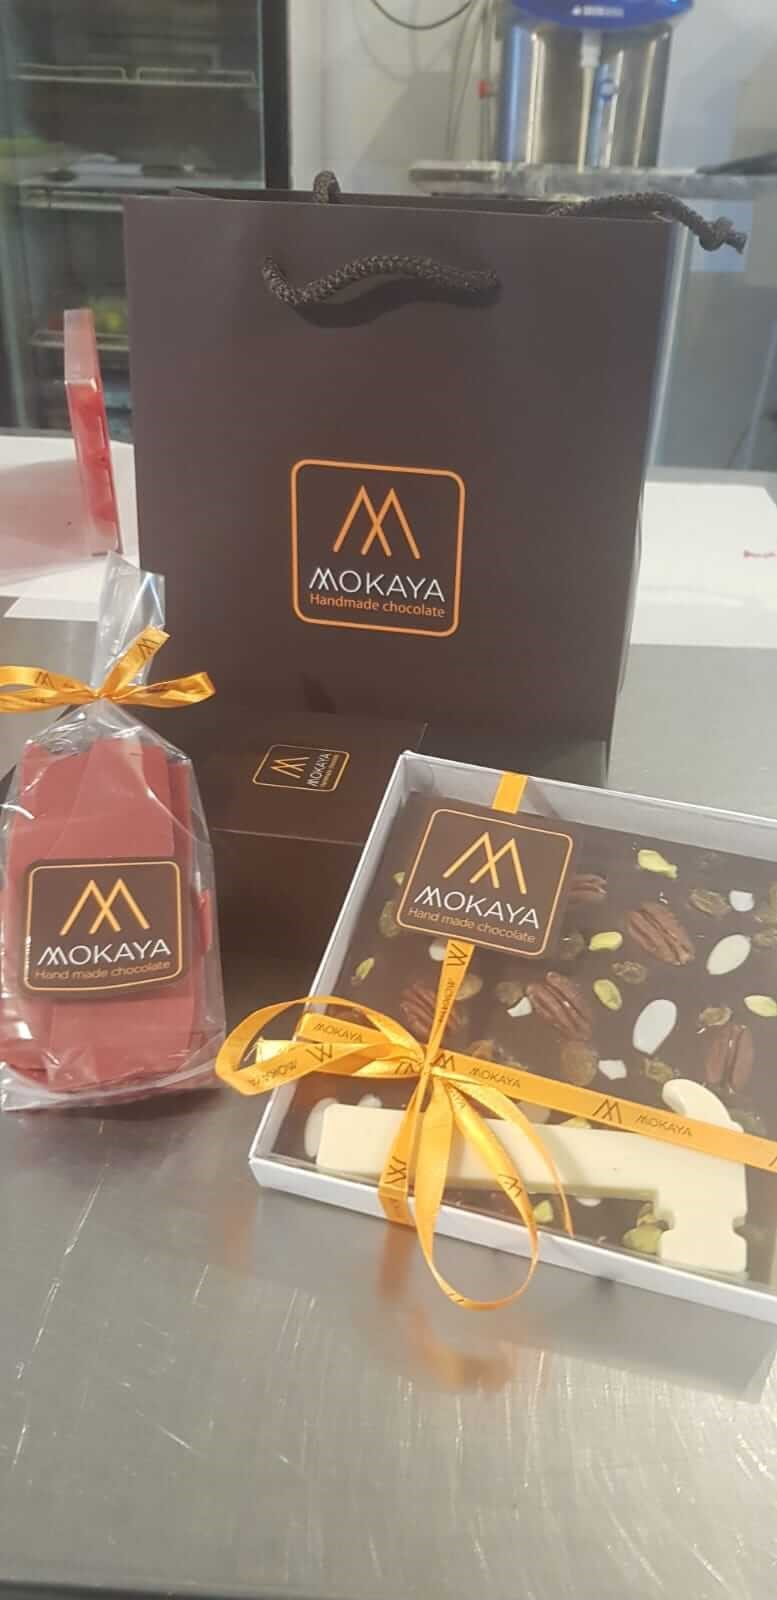 Mokaya - מתנות עם שוקולדים שכולם אוהבים